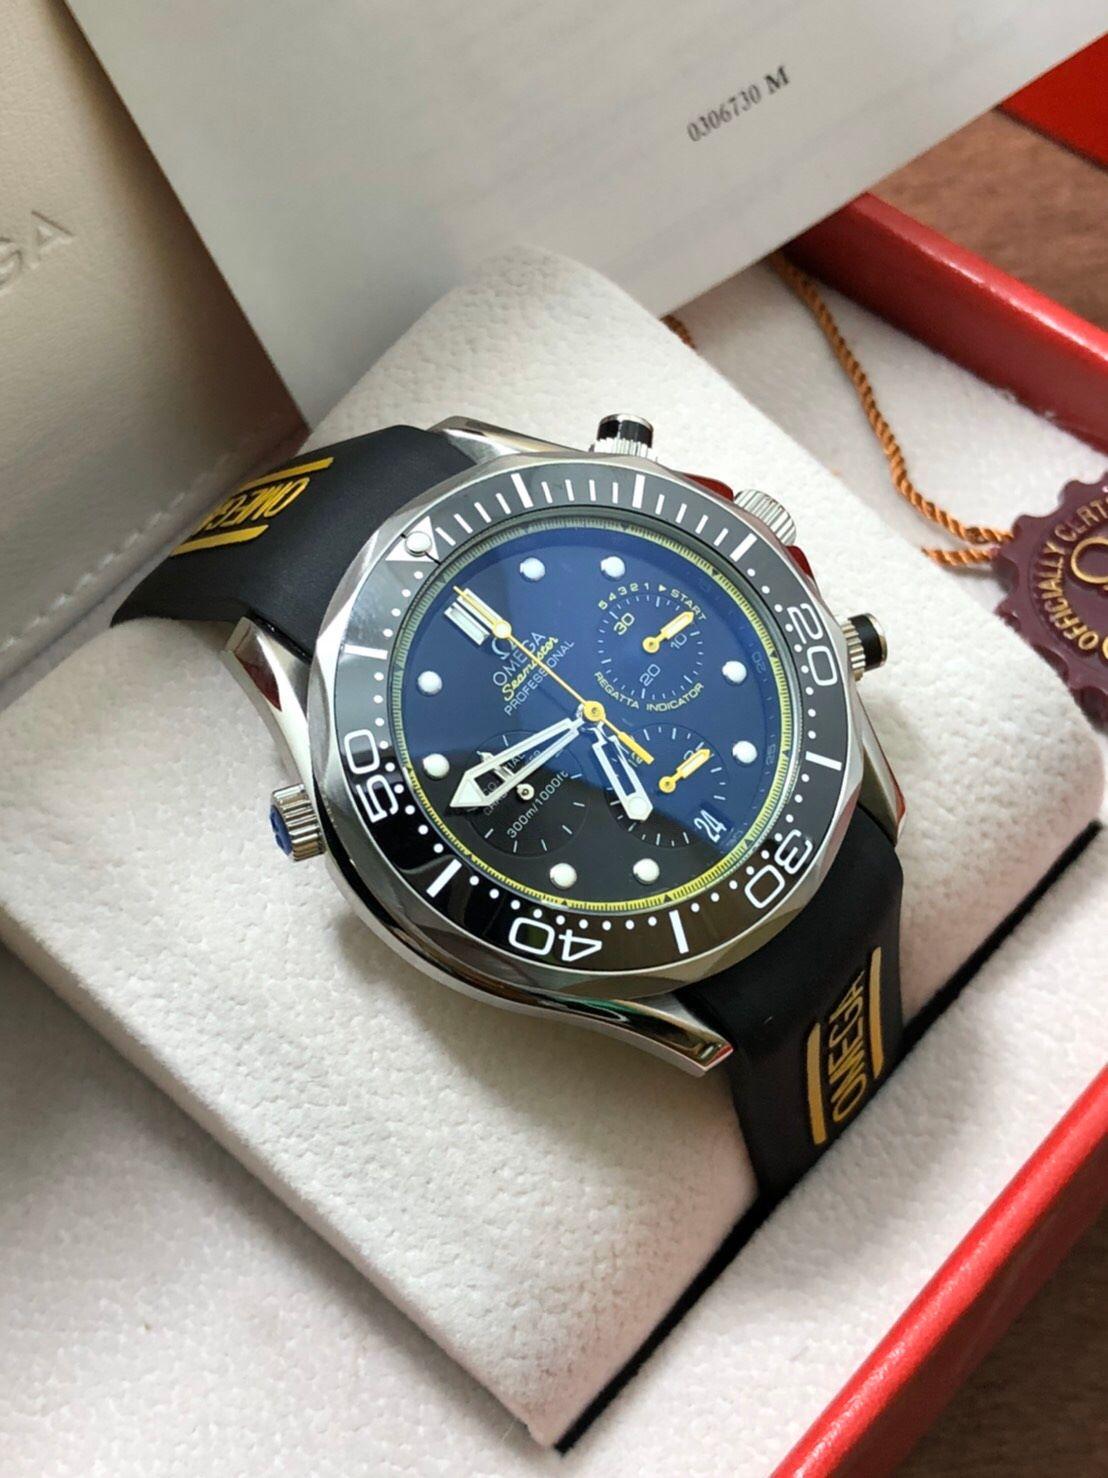 Omega Seamaster Diver 300m Chronograph ETNZ Limited Edition Rubber strap Black Dial